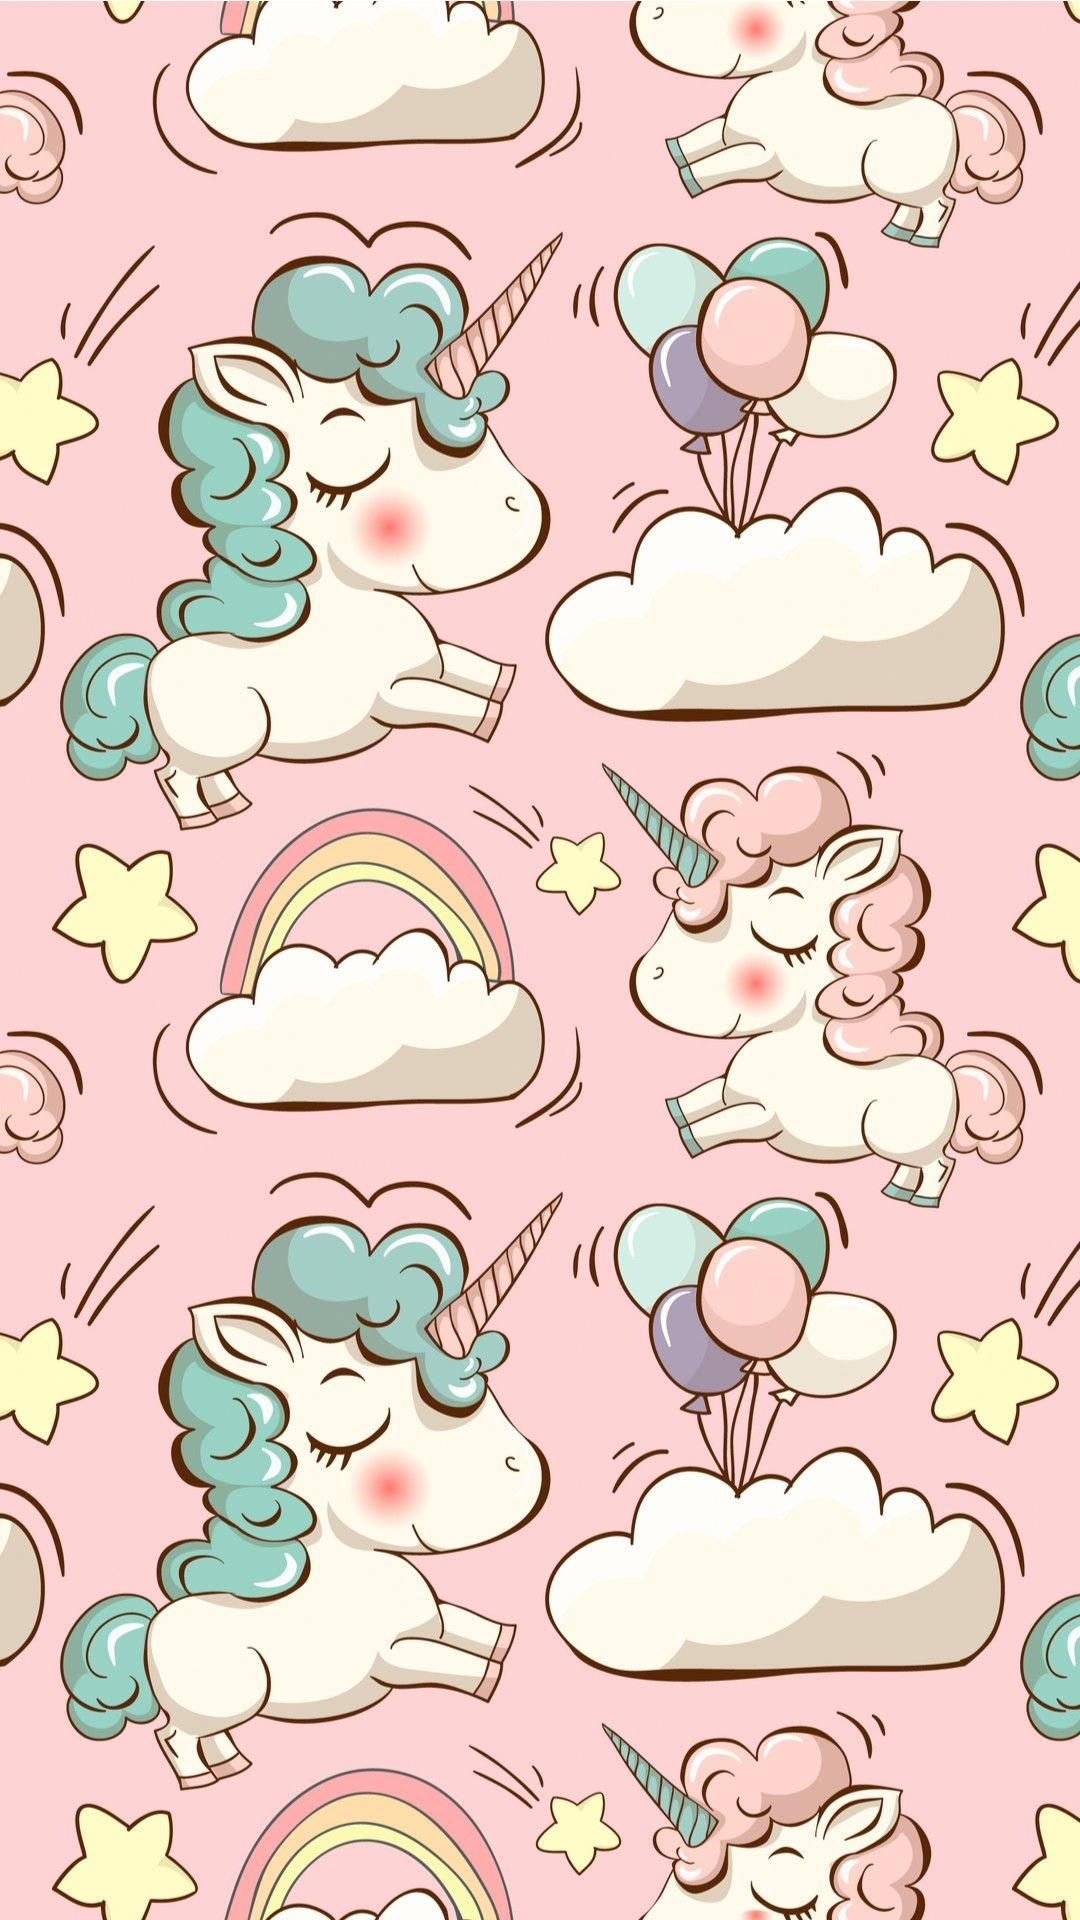 Unicorn wallpapers unicornwallpaper in 2020 Unicorn